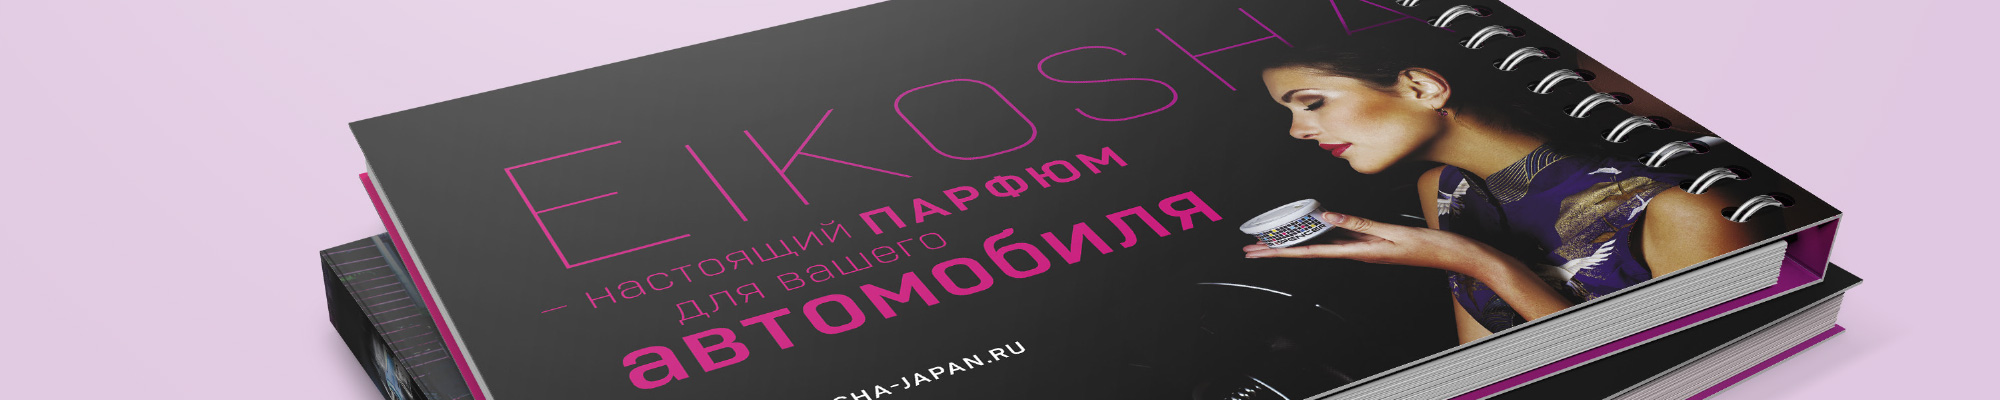 Каталог автоароматизаторов Eikosha